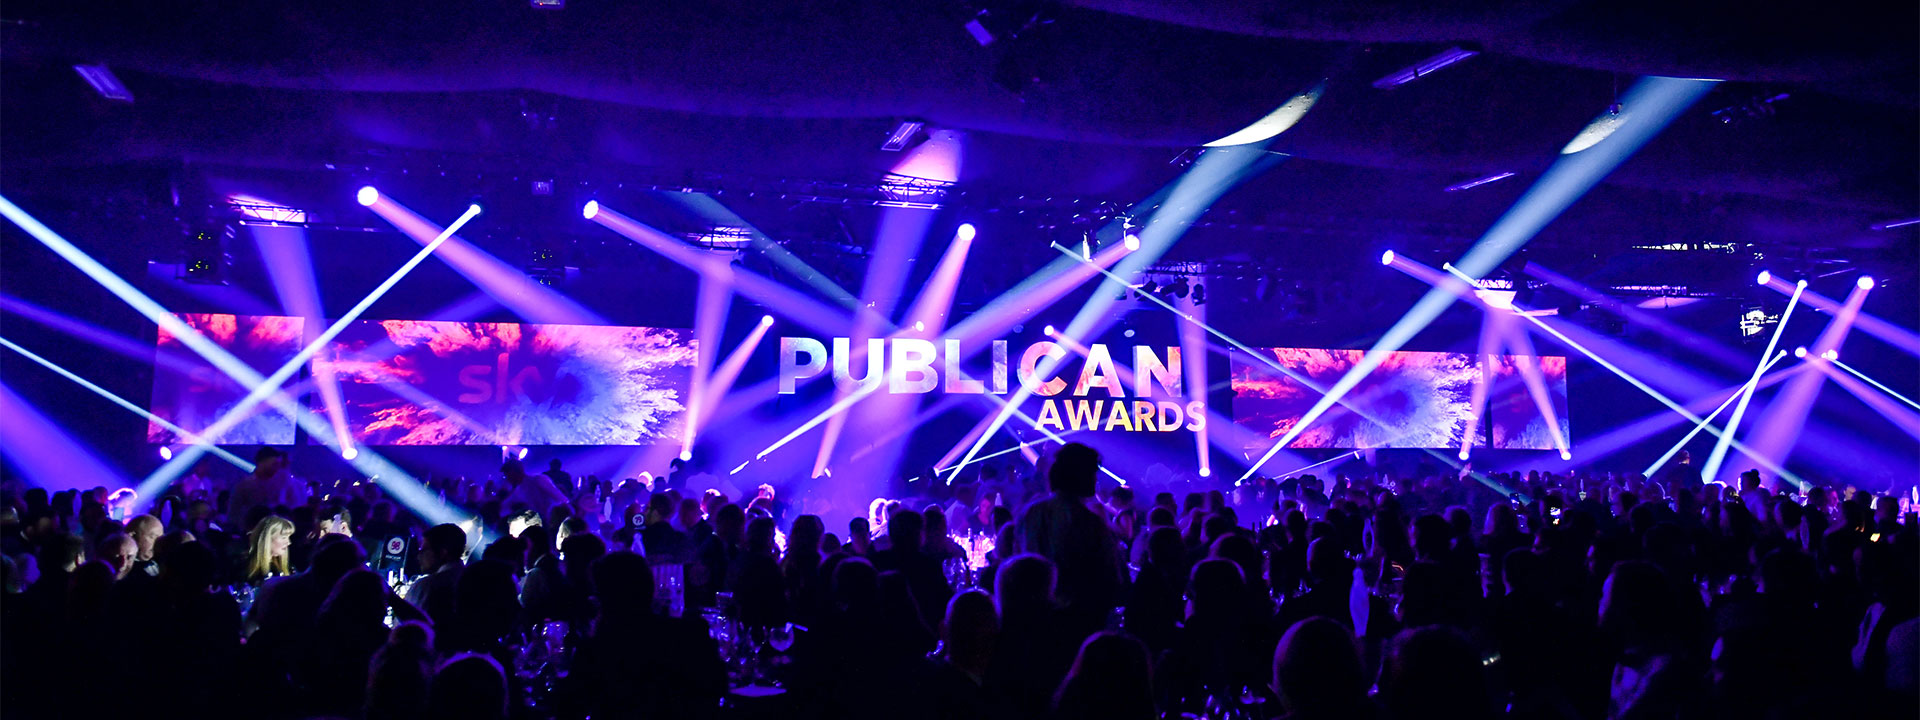 Publican Awards 2019